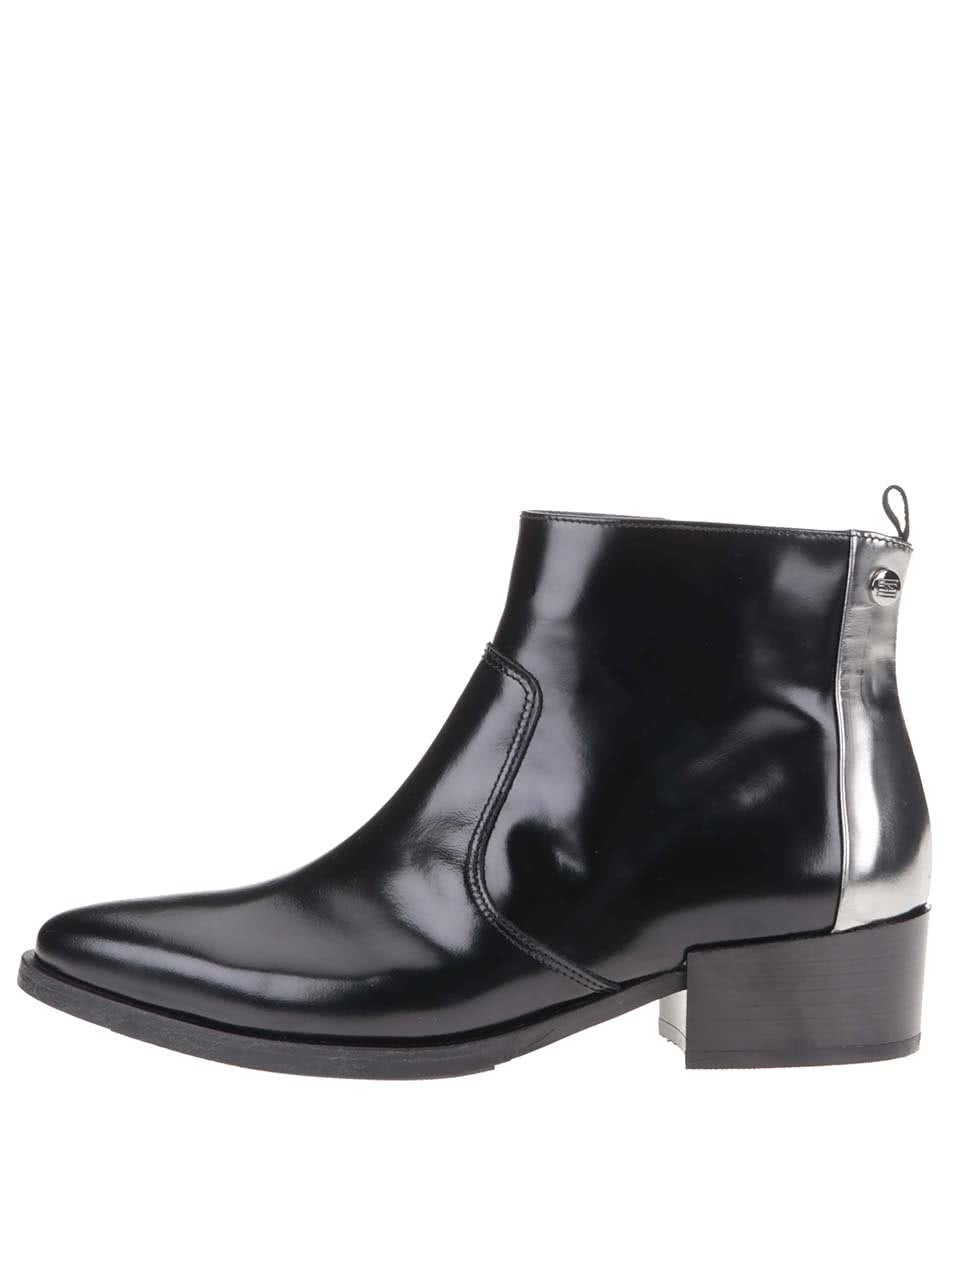 151b380986 Čierne dámske kožené členkové topánky Tommy Hilfiger PIPPA ...